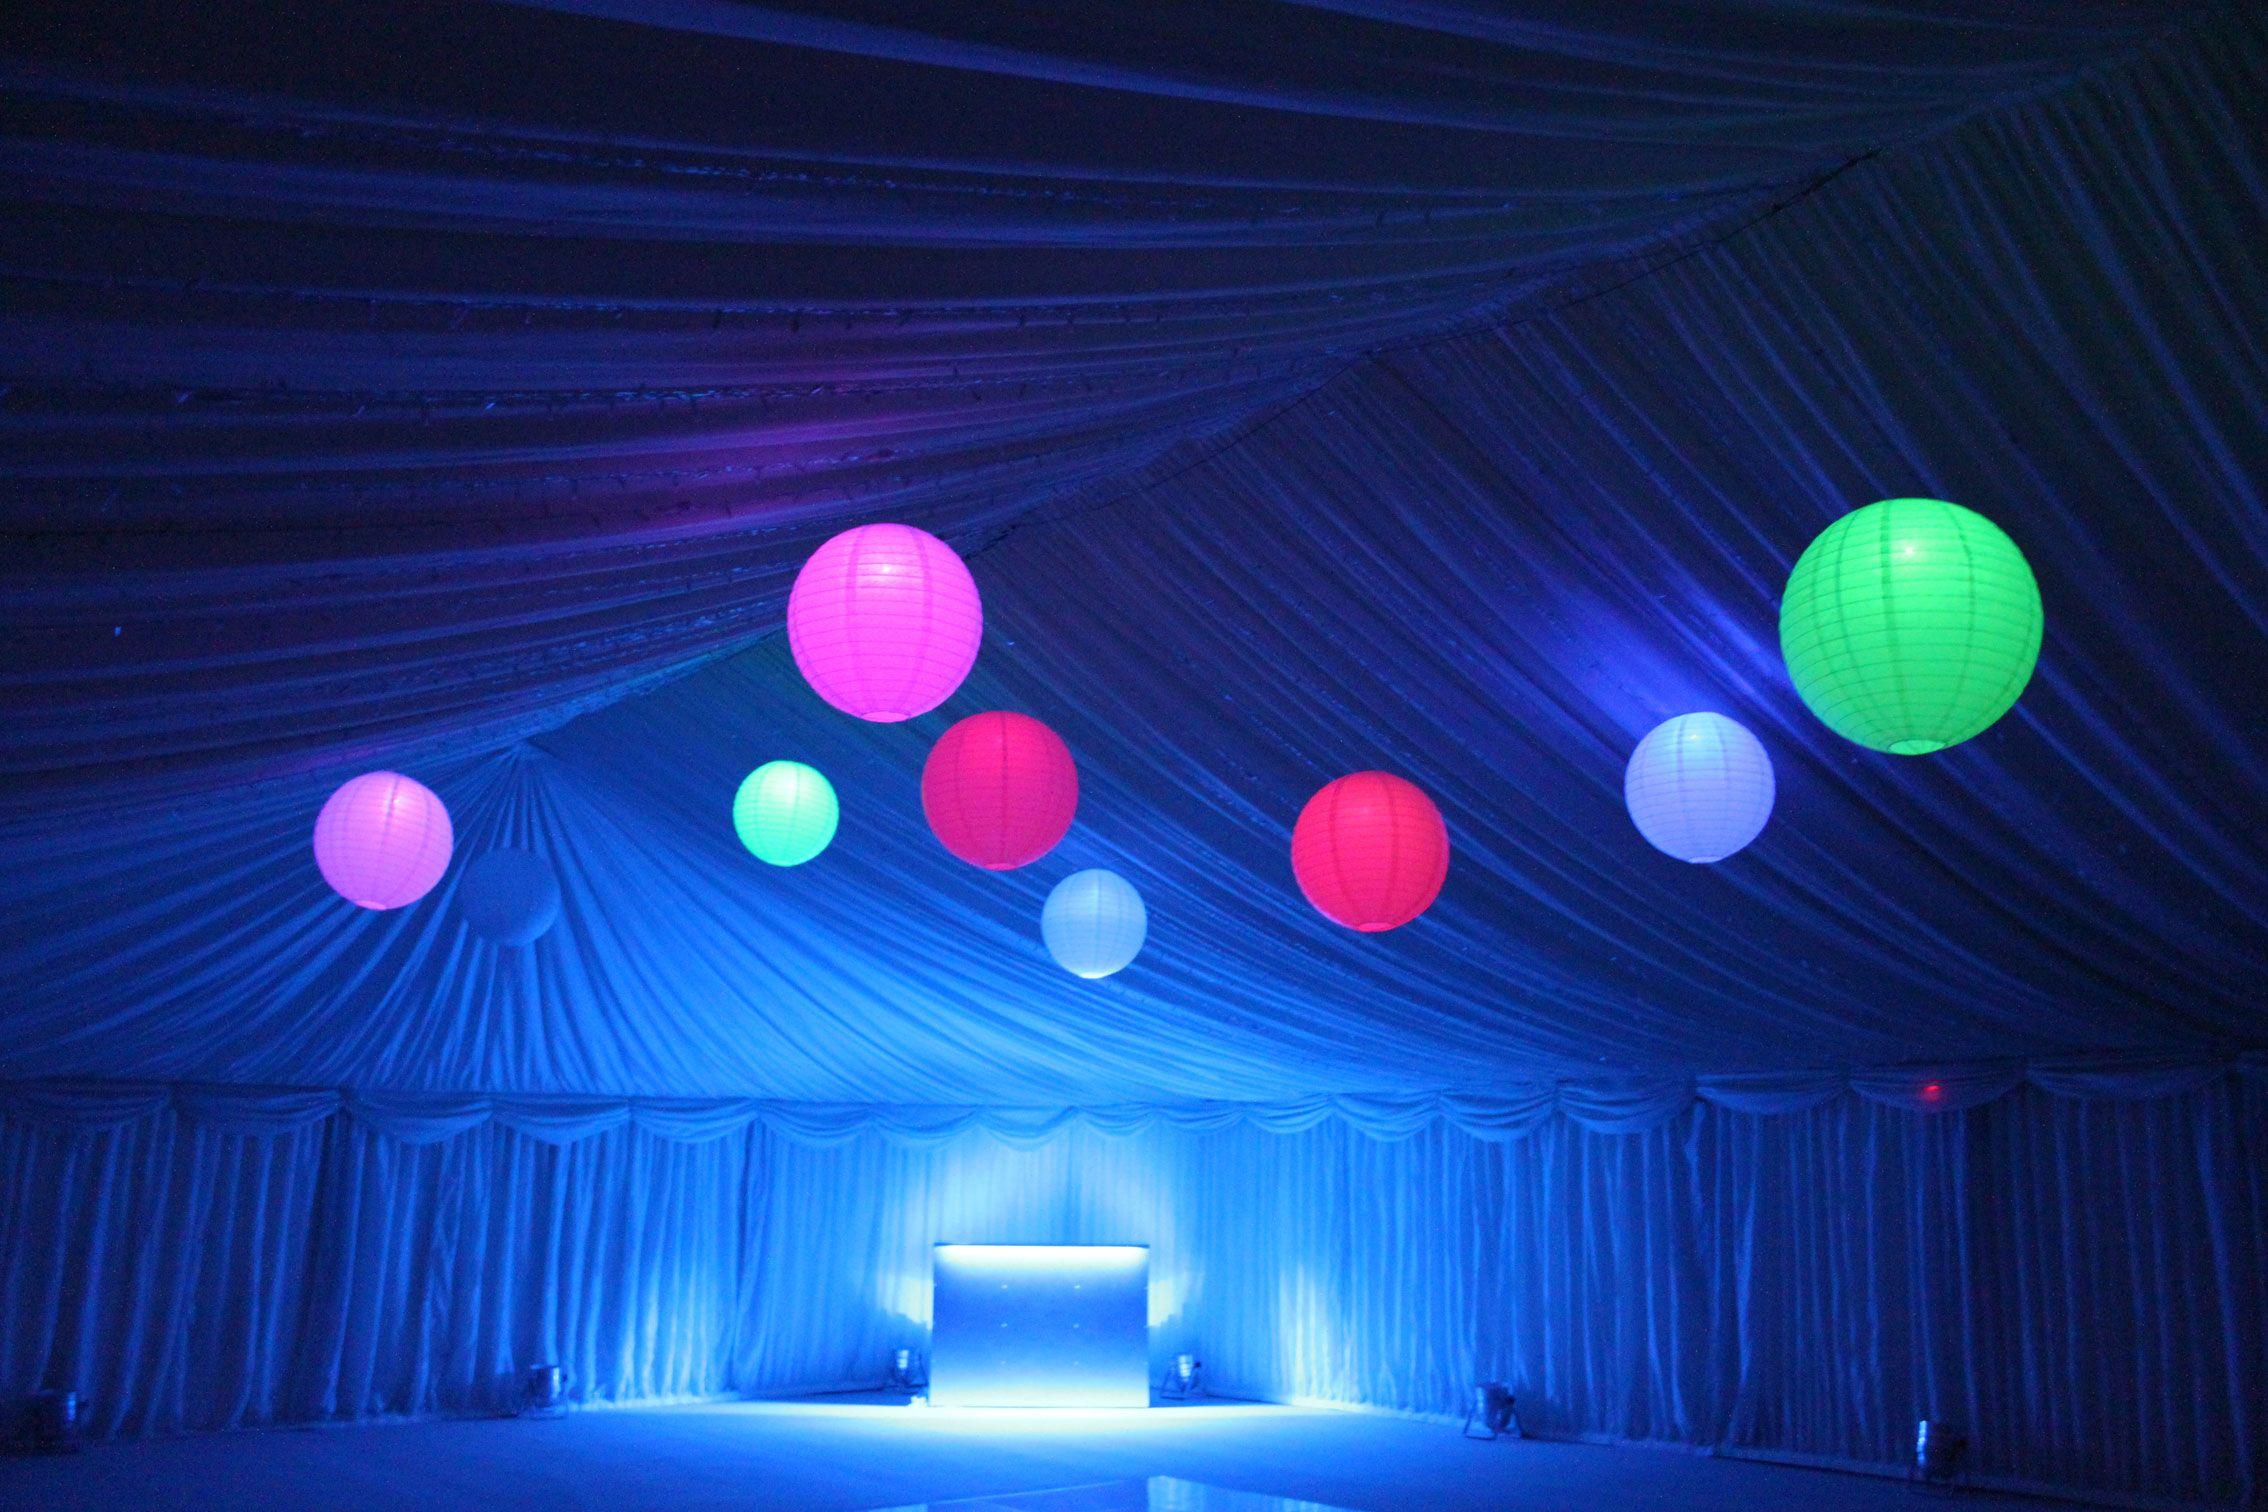 Light blue wedding decoration ideas  tent with lanterns  Wedding Ideas  Pinterest  Wedding